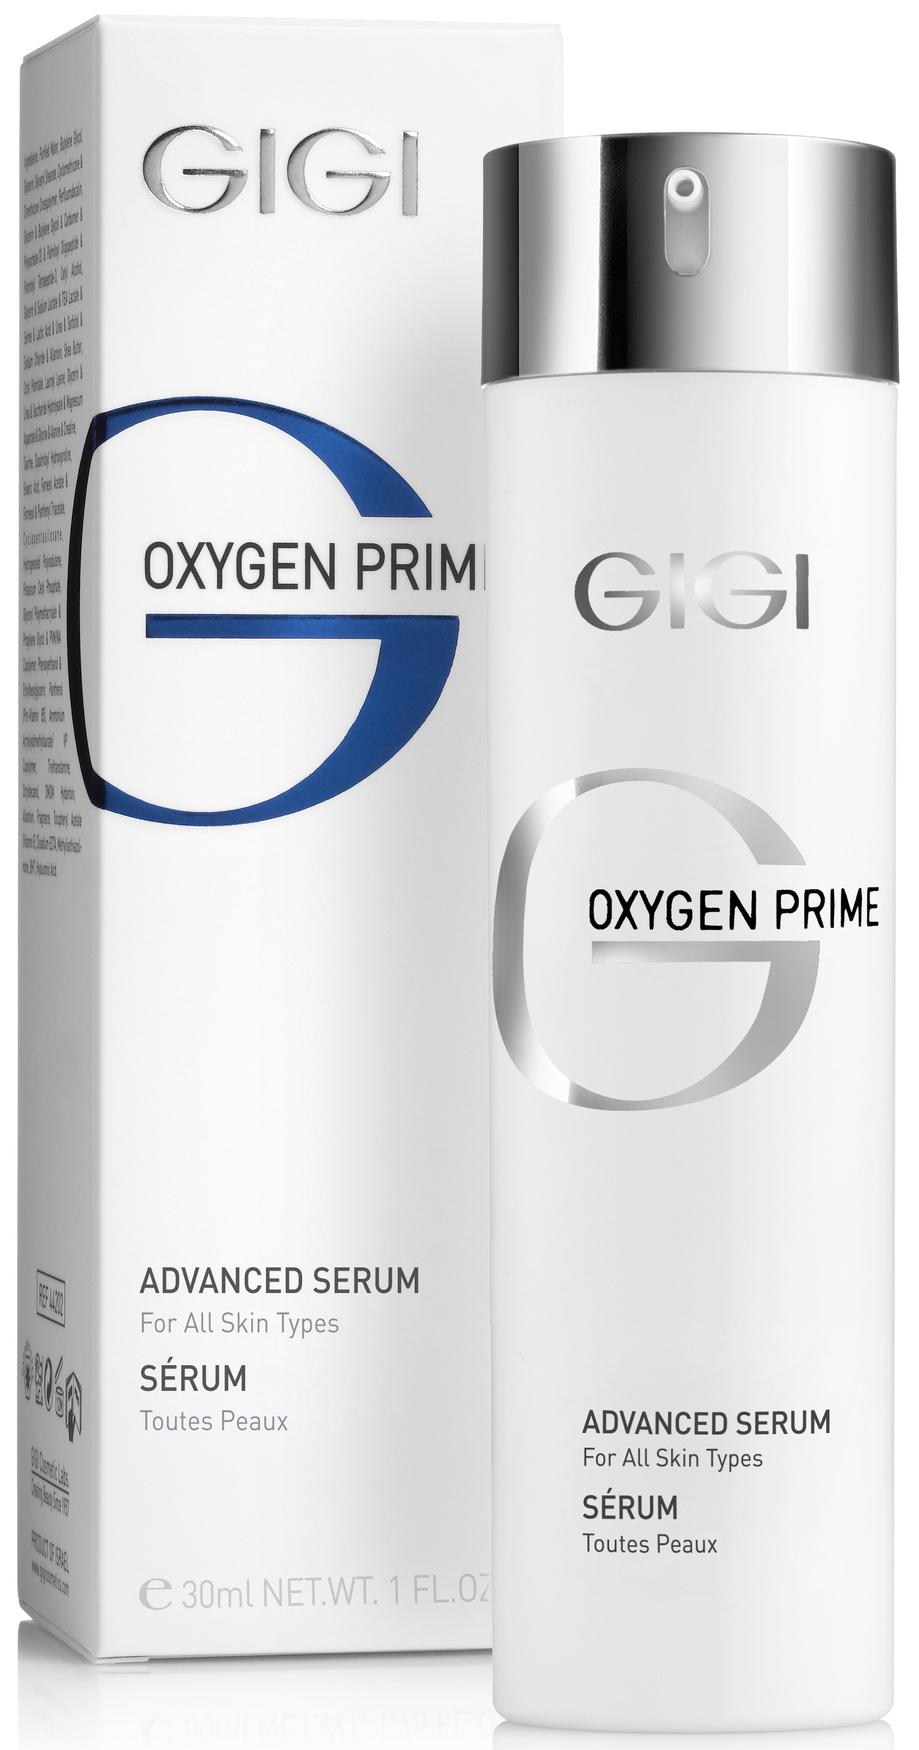 Oxygen Prime Advanced Serum